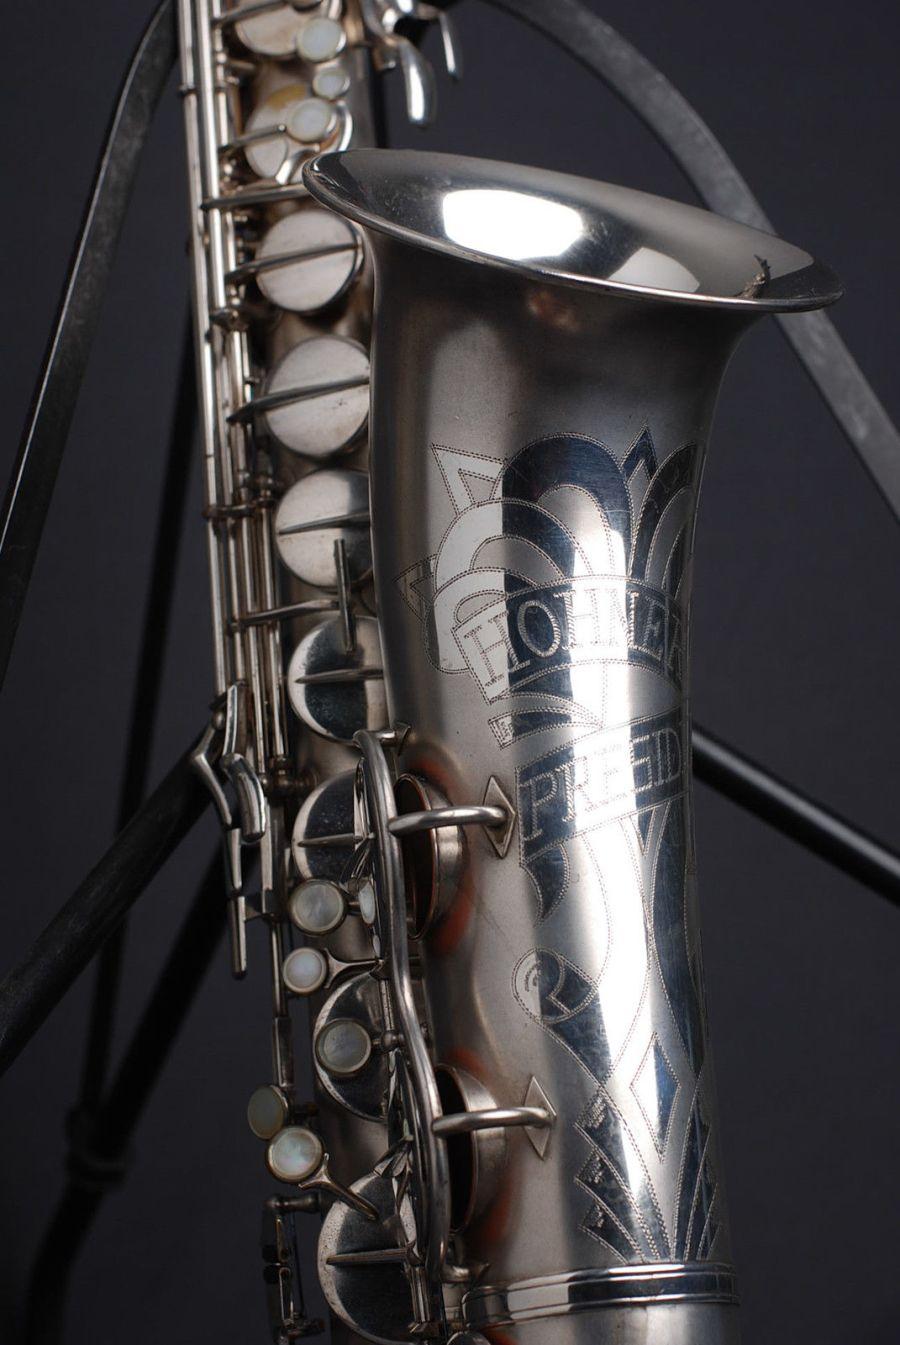 Hohner President, tenor sax, vintage sax, German sax, Max Keilwerth, saxophone, bell engraving